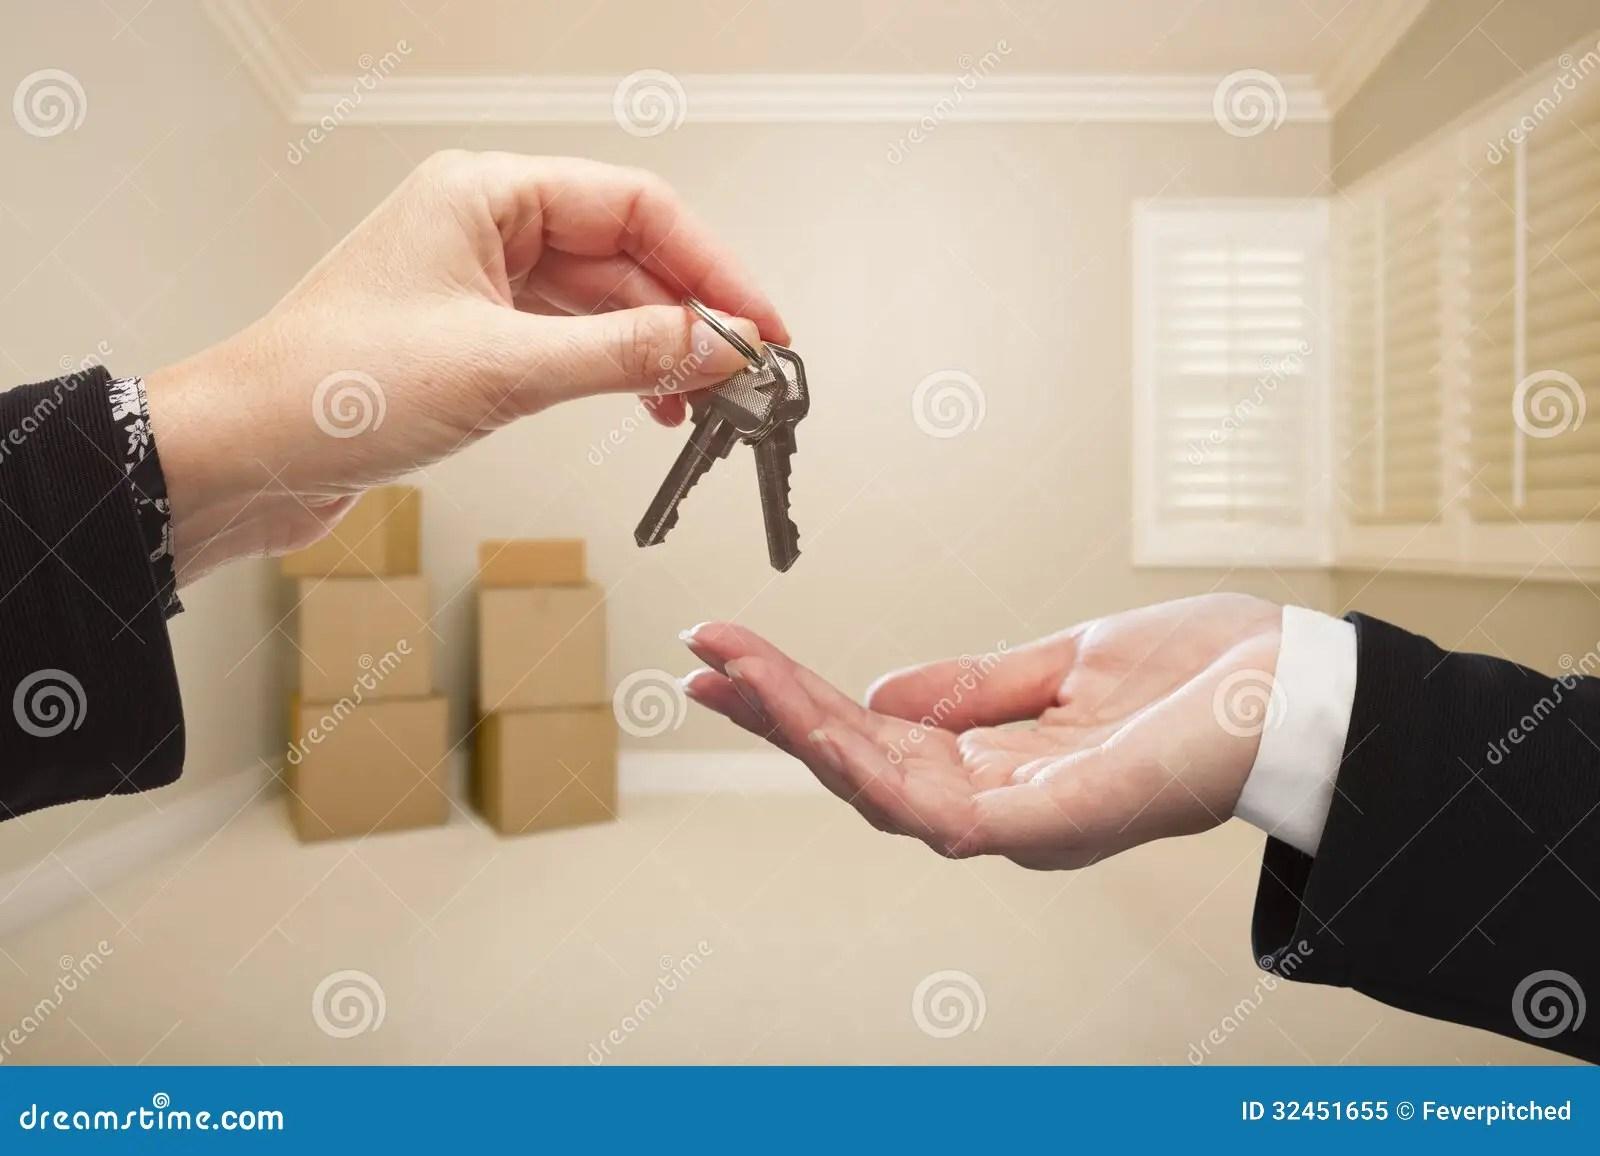 Womans Hands Handing Over The House Keys Inside Empty Tan